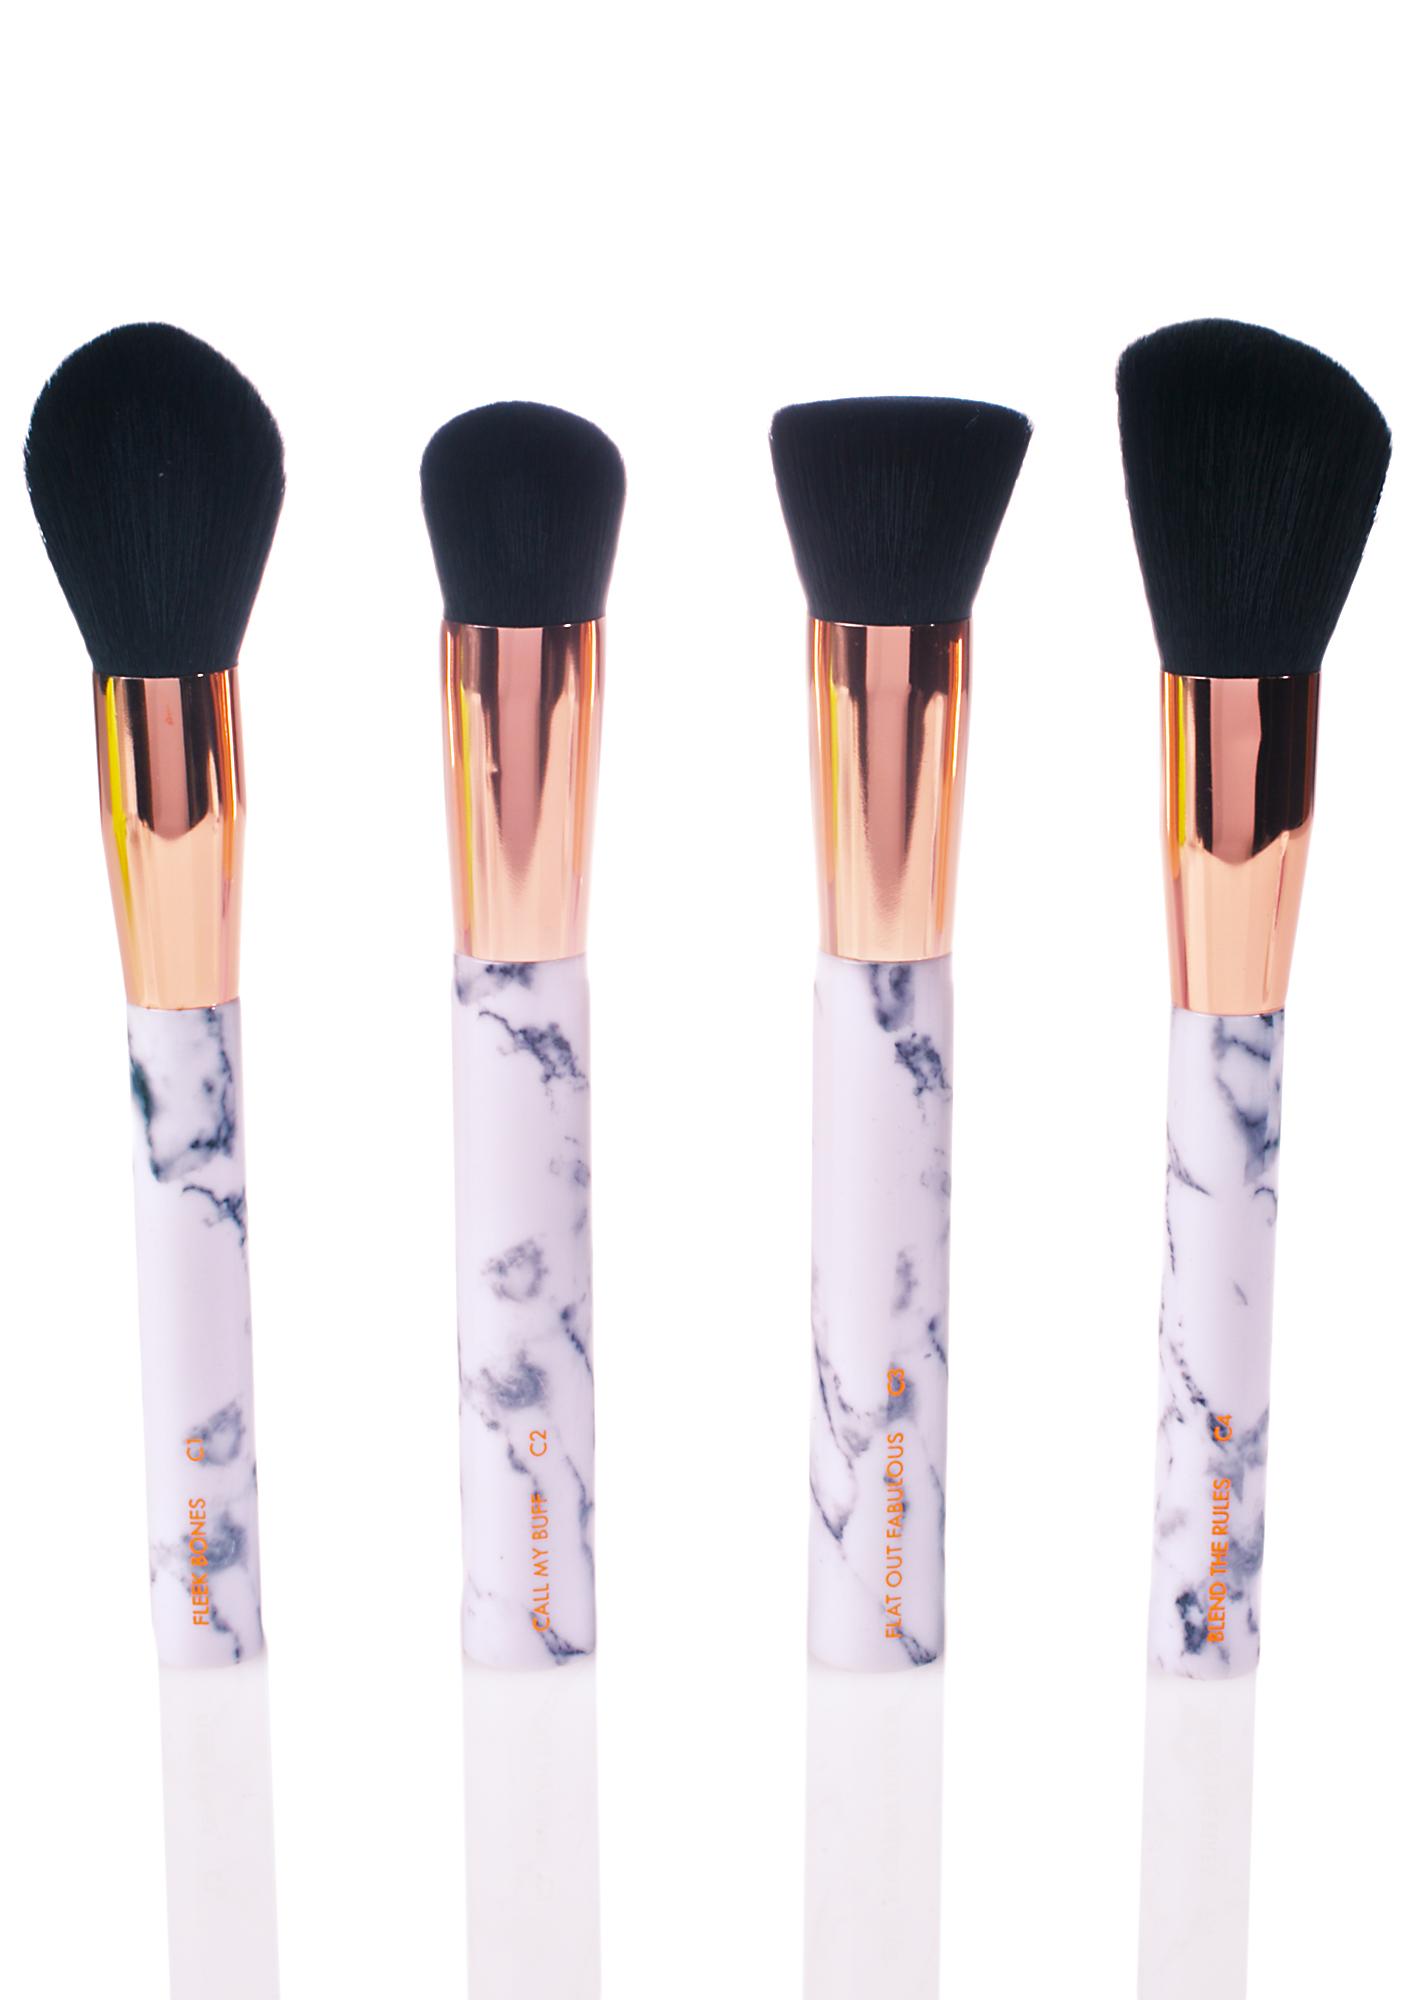 Skinnydip Marble Shut The Contour Brush Set